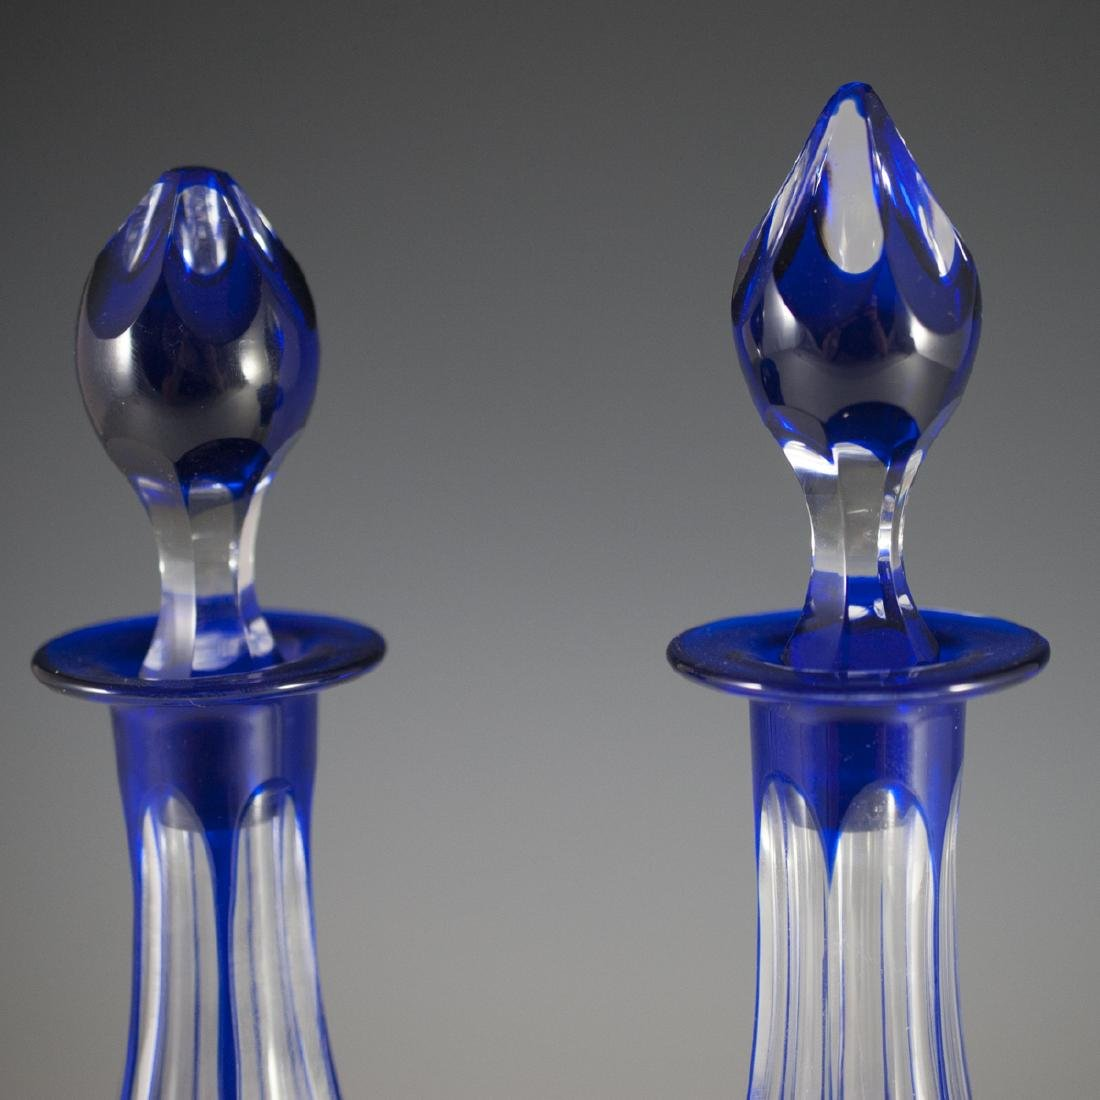 Bohemian Cobalt Crystal Decanters - 3